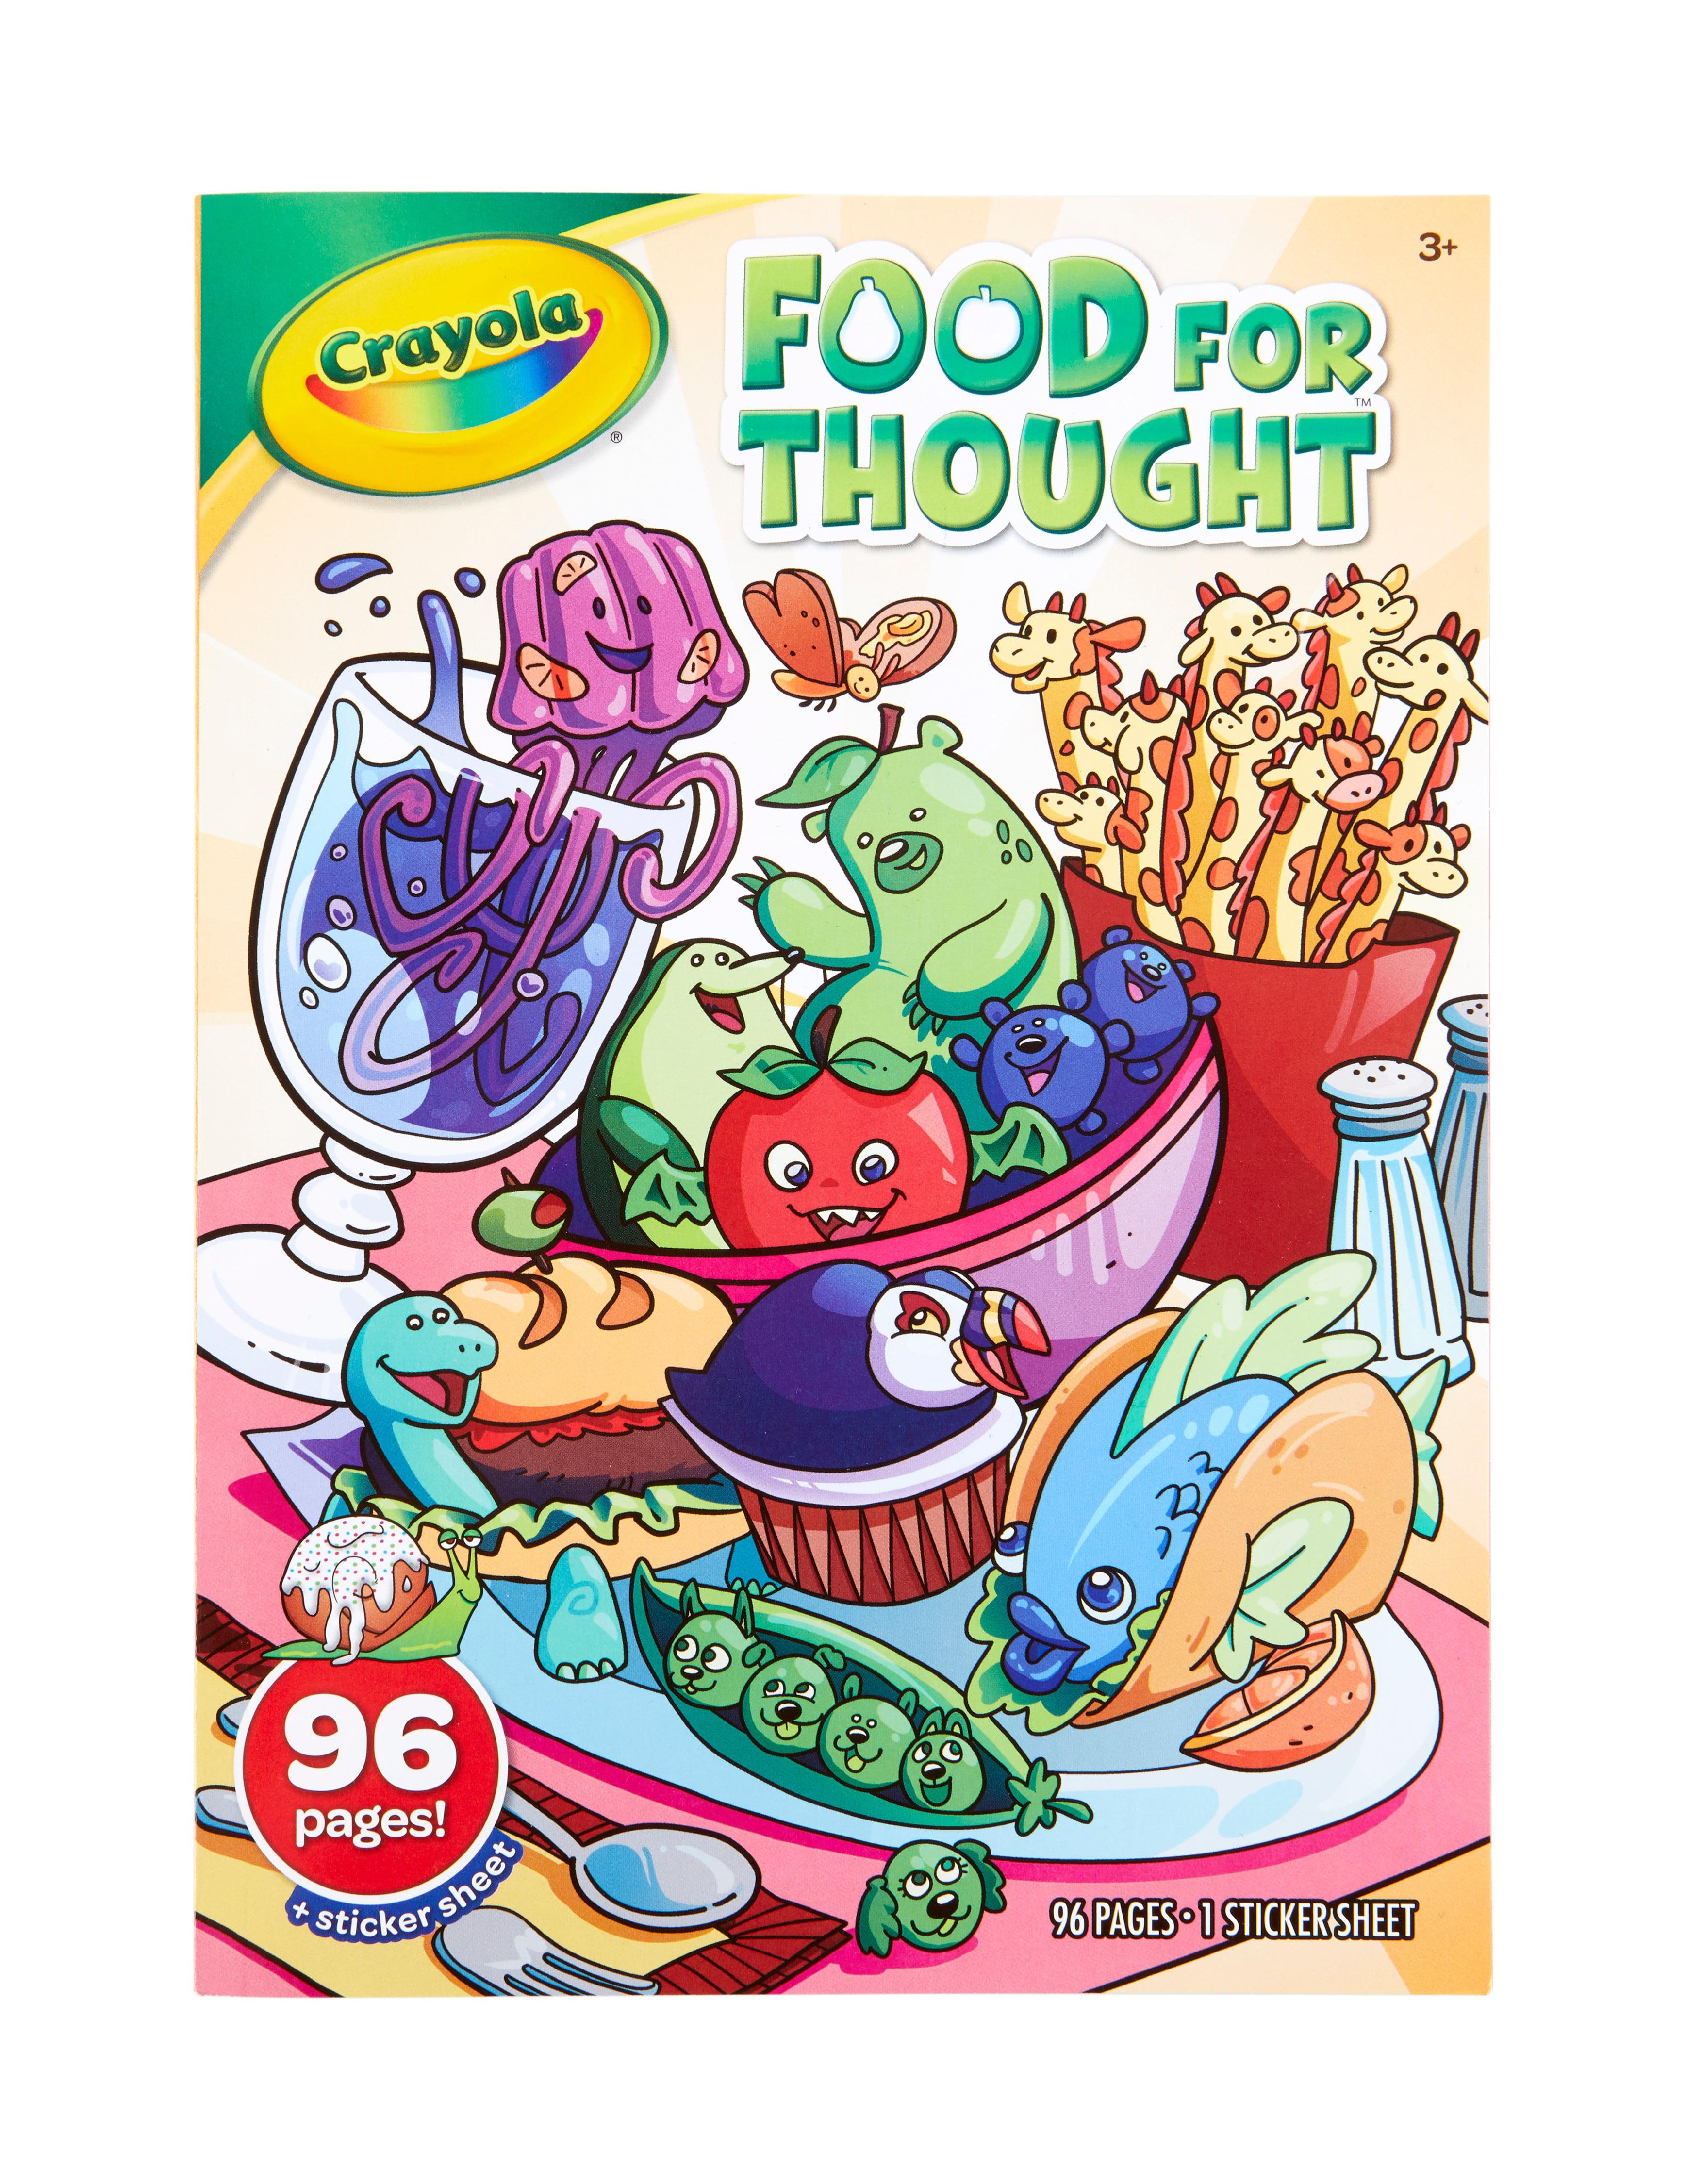 Crayola Sticker /& Colouring Book with Reusable Stickers /& Crayola Crayons